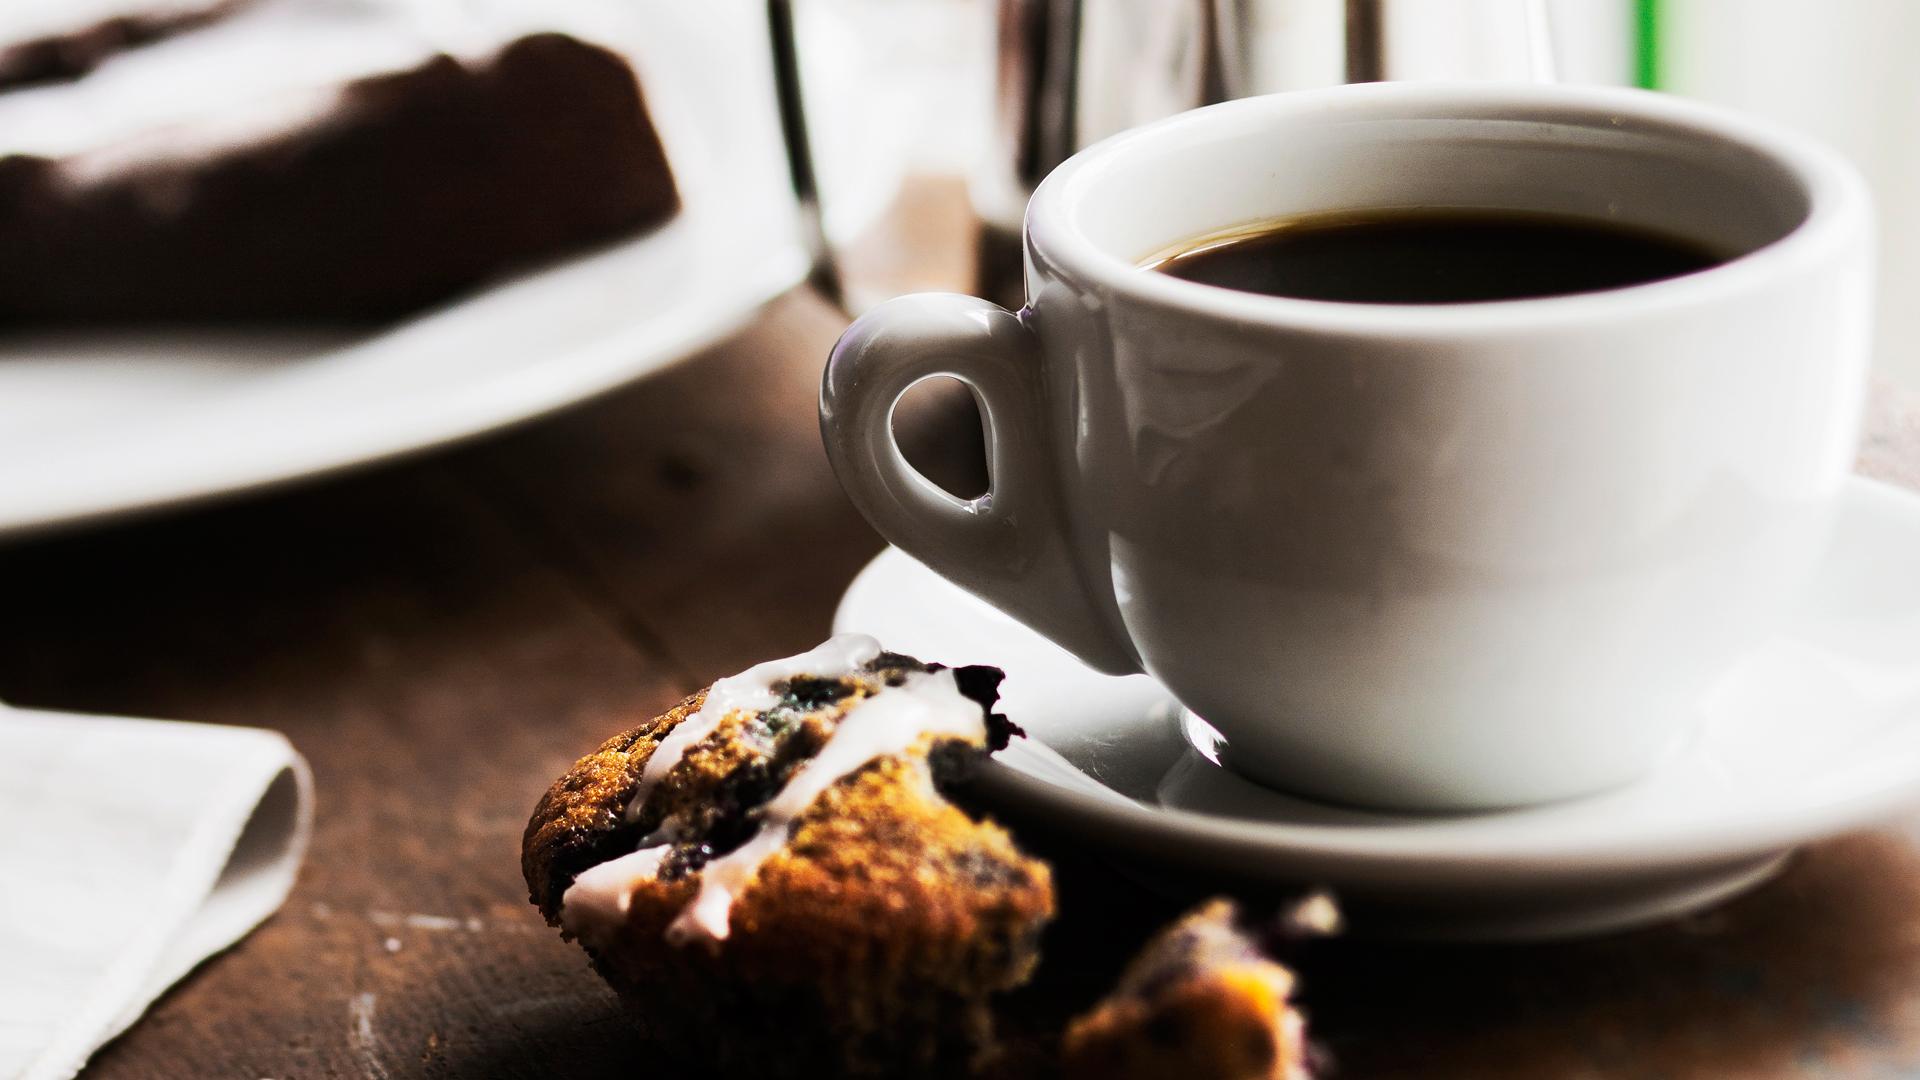 Kahvinjuonti